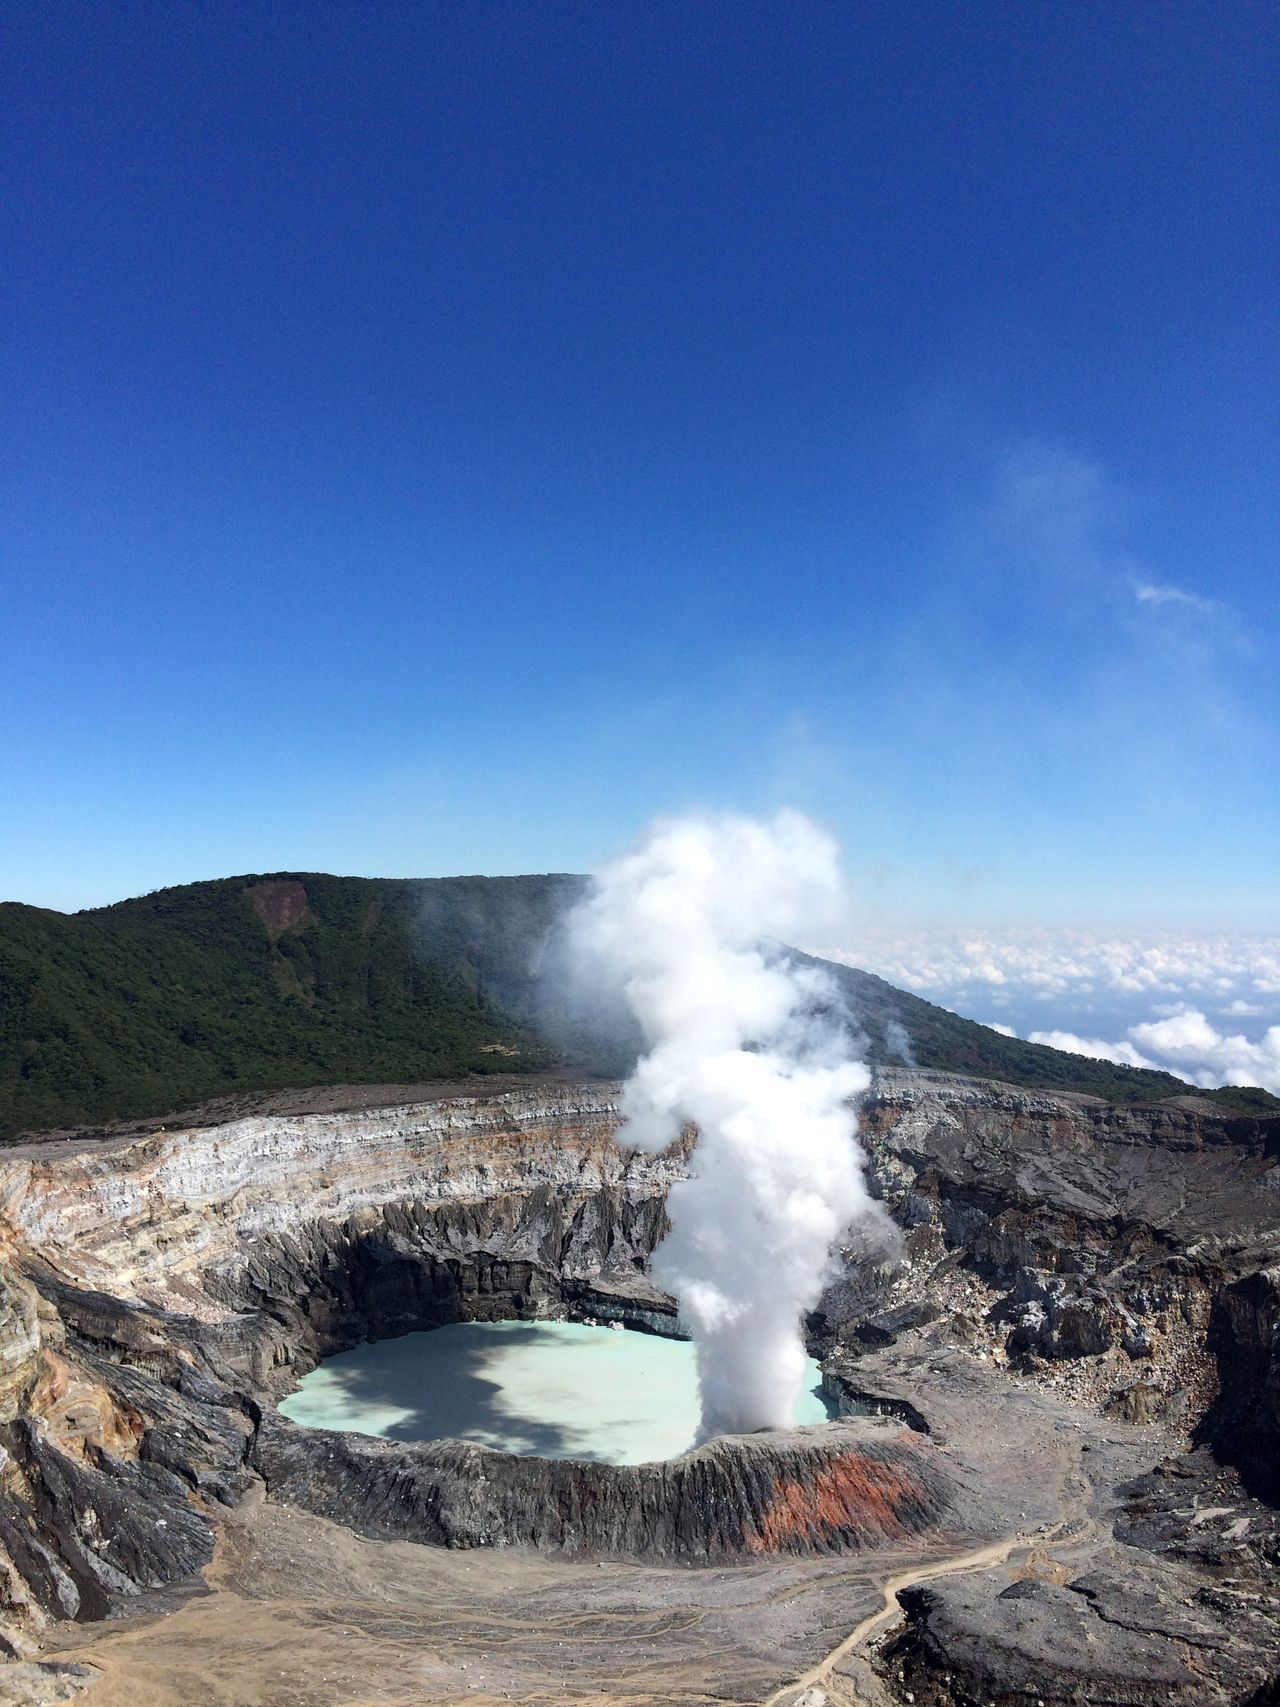 EyeEm Best Shots Volcano Exploring Landscape Landscape_photography Trip Costa Rica